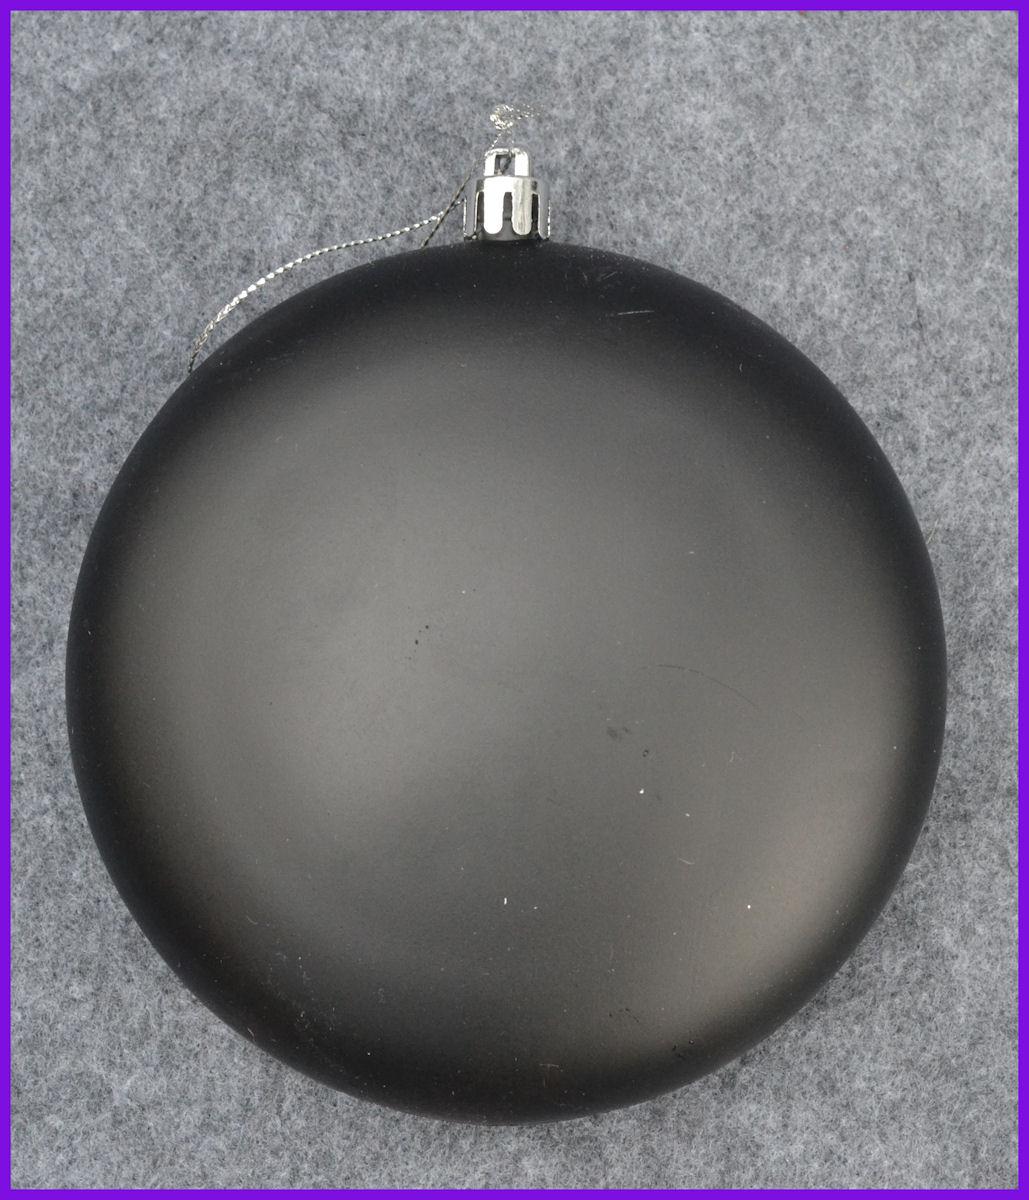 da-black-ornament-5-inch-8909205747-sm.jpg